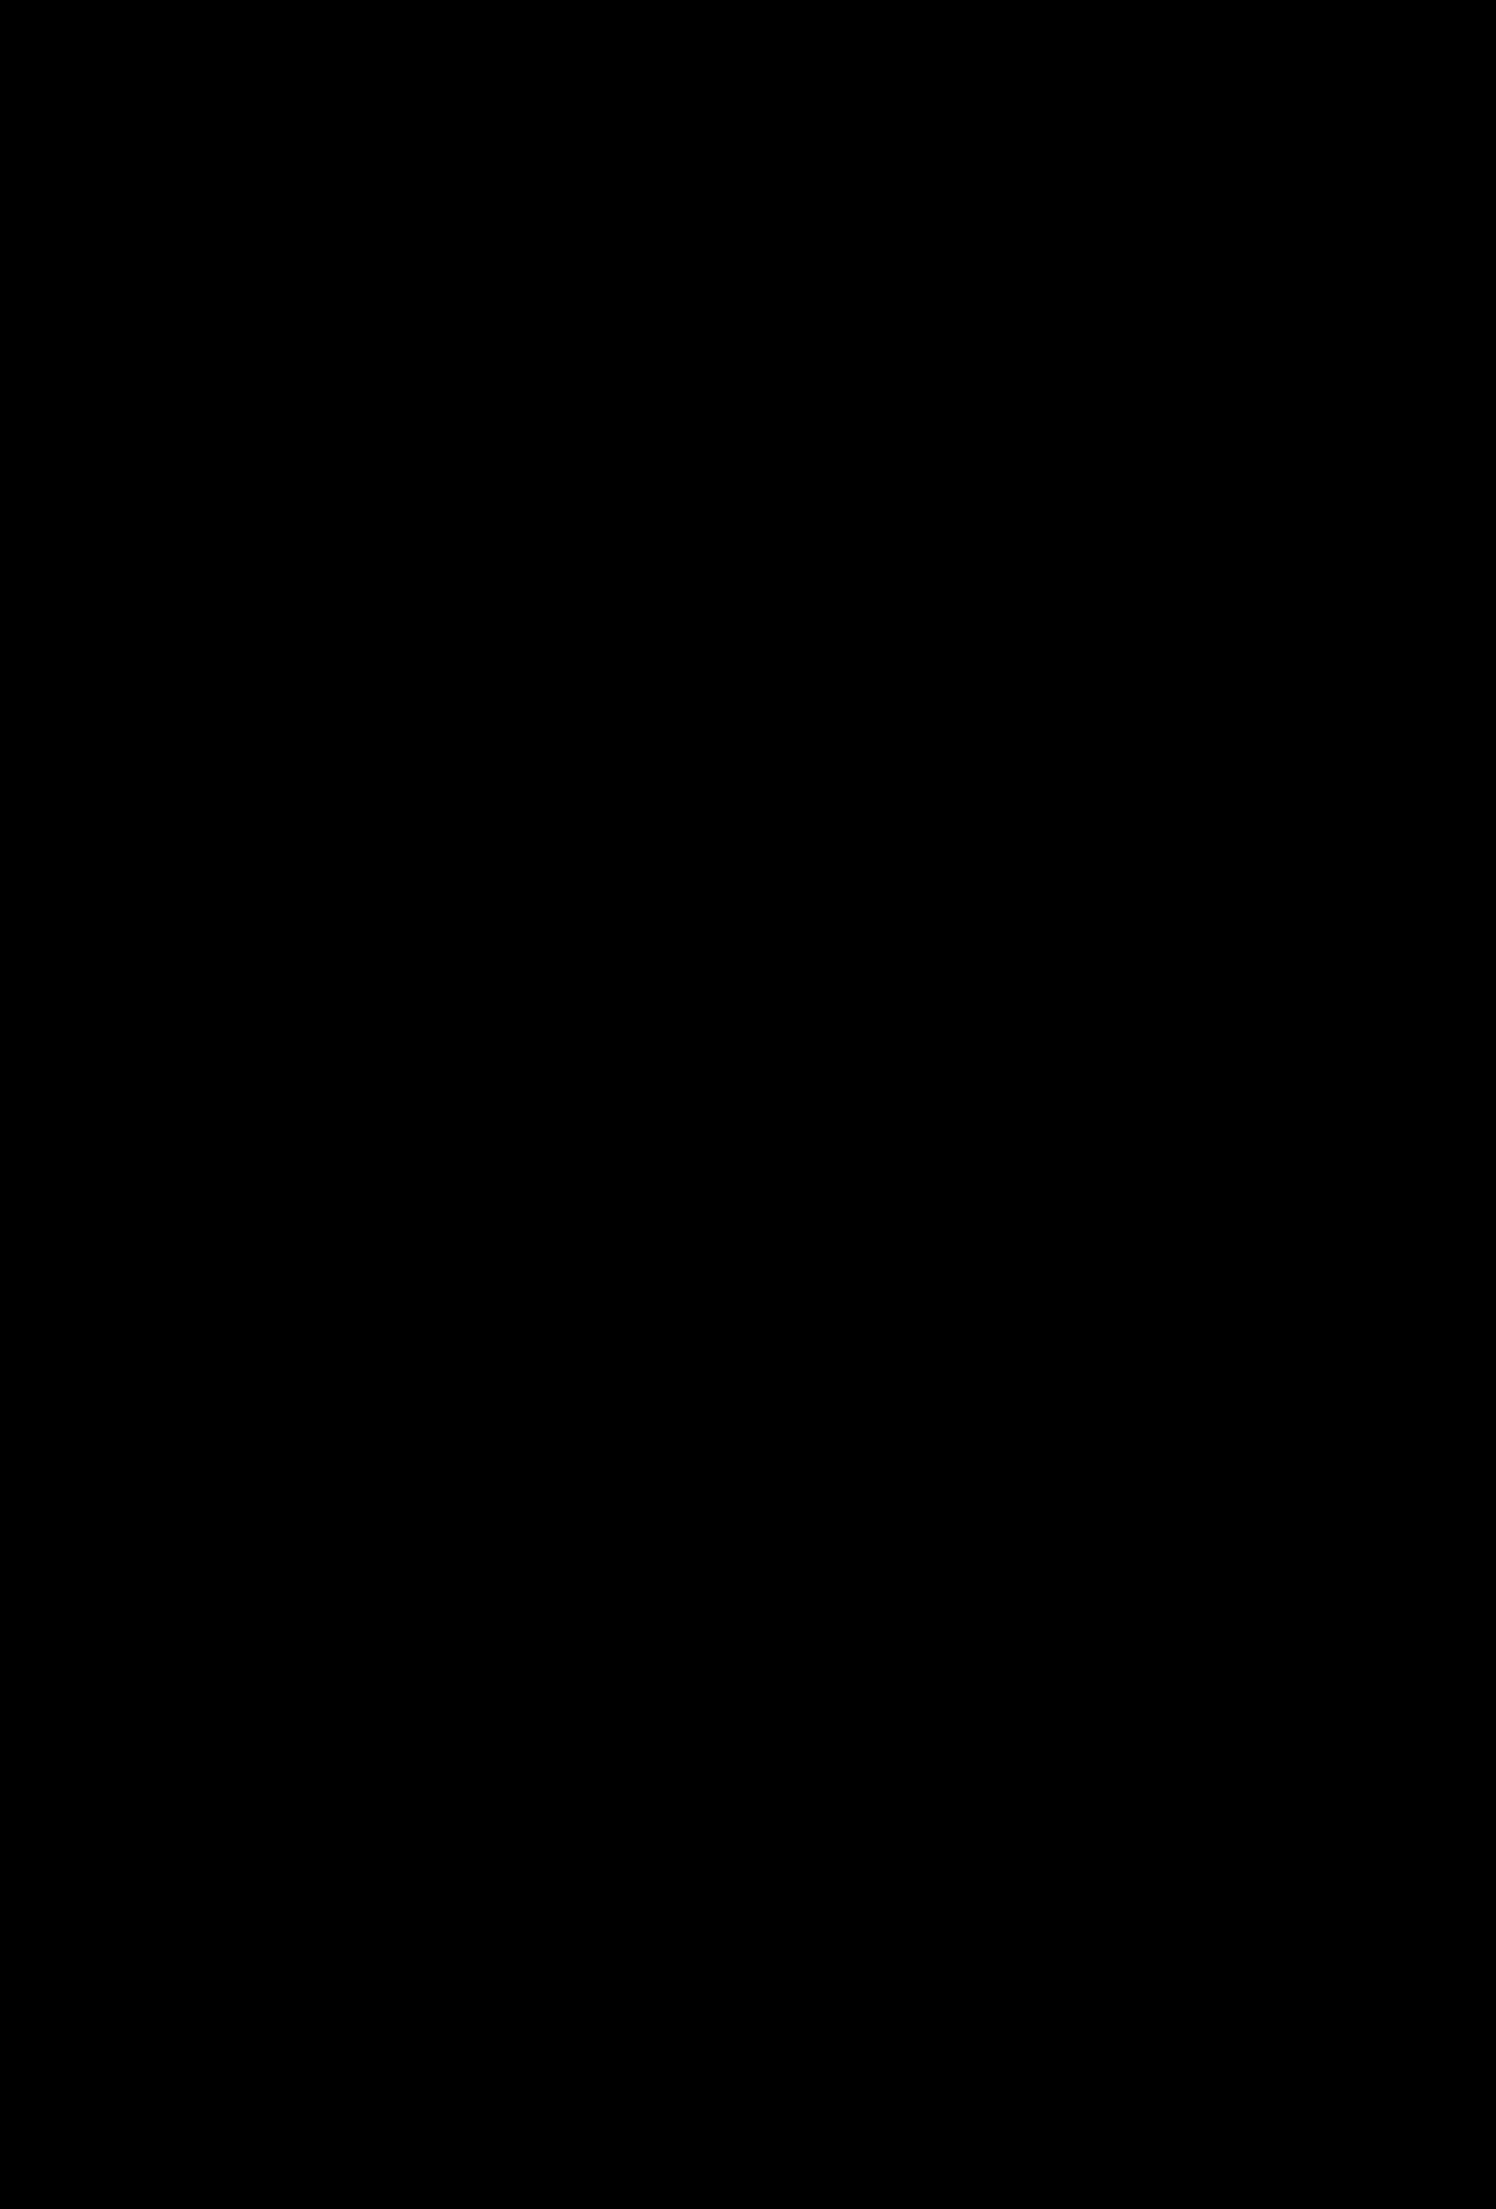 1496x2209 Clip Art Camera Silhouette Clip Art